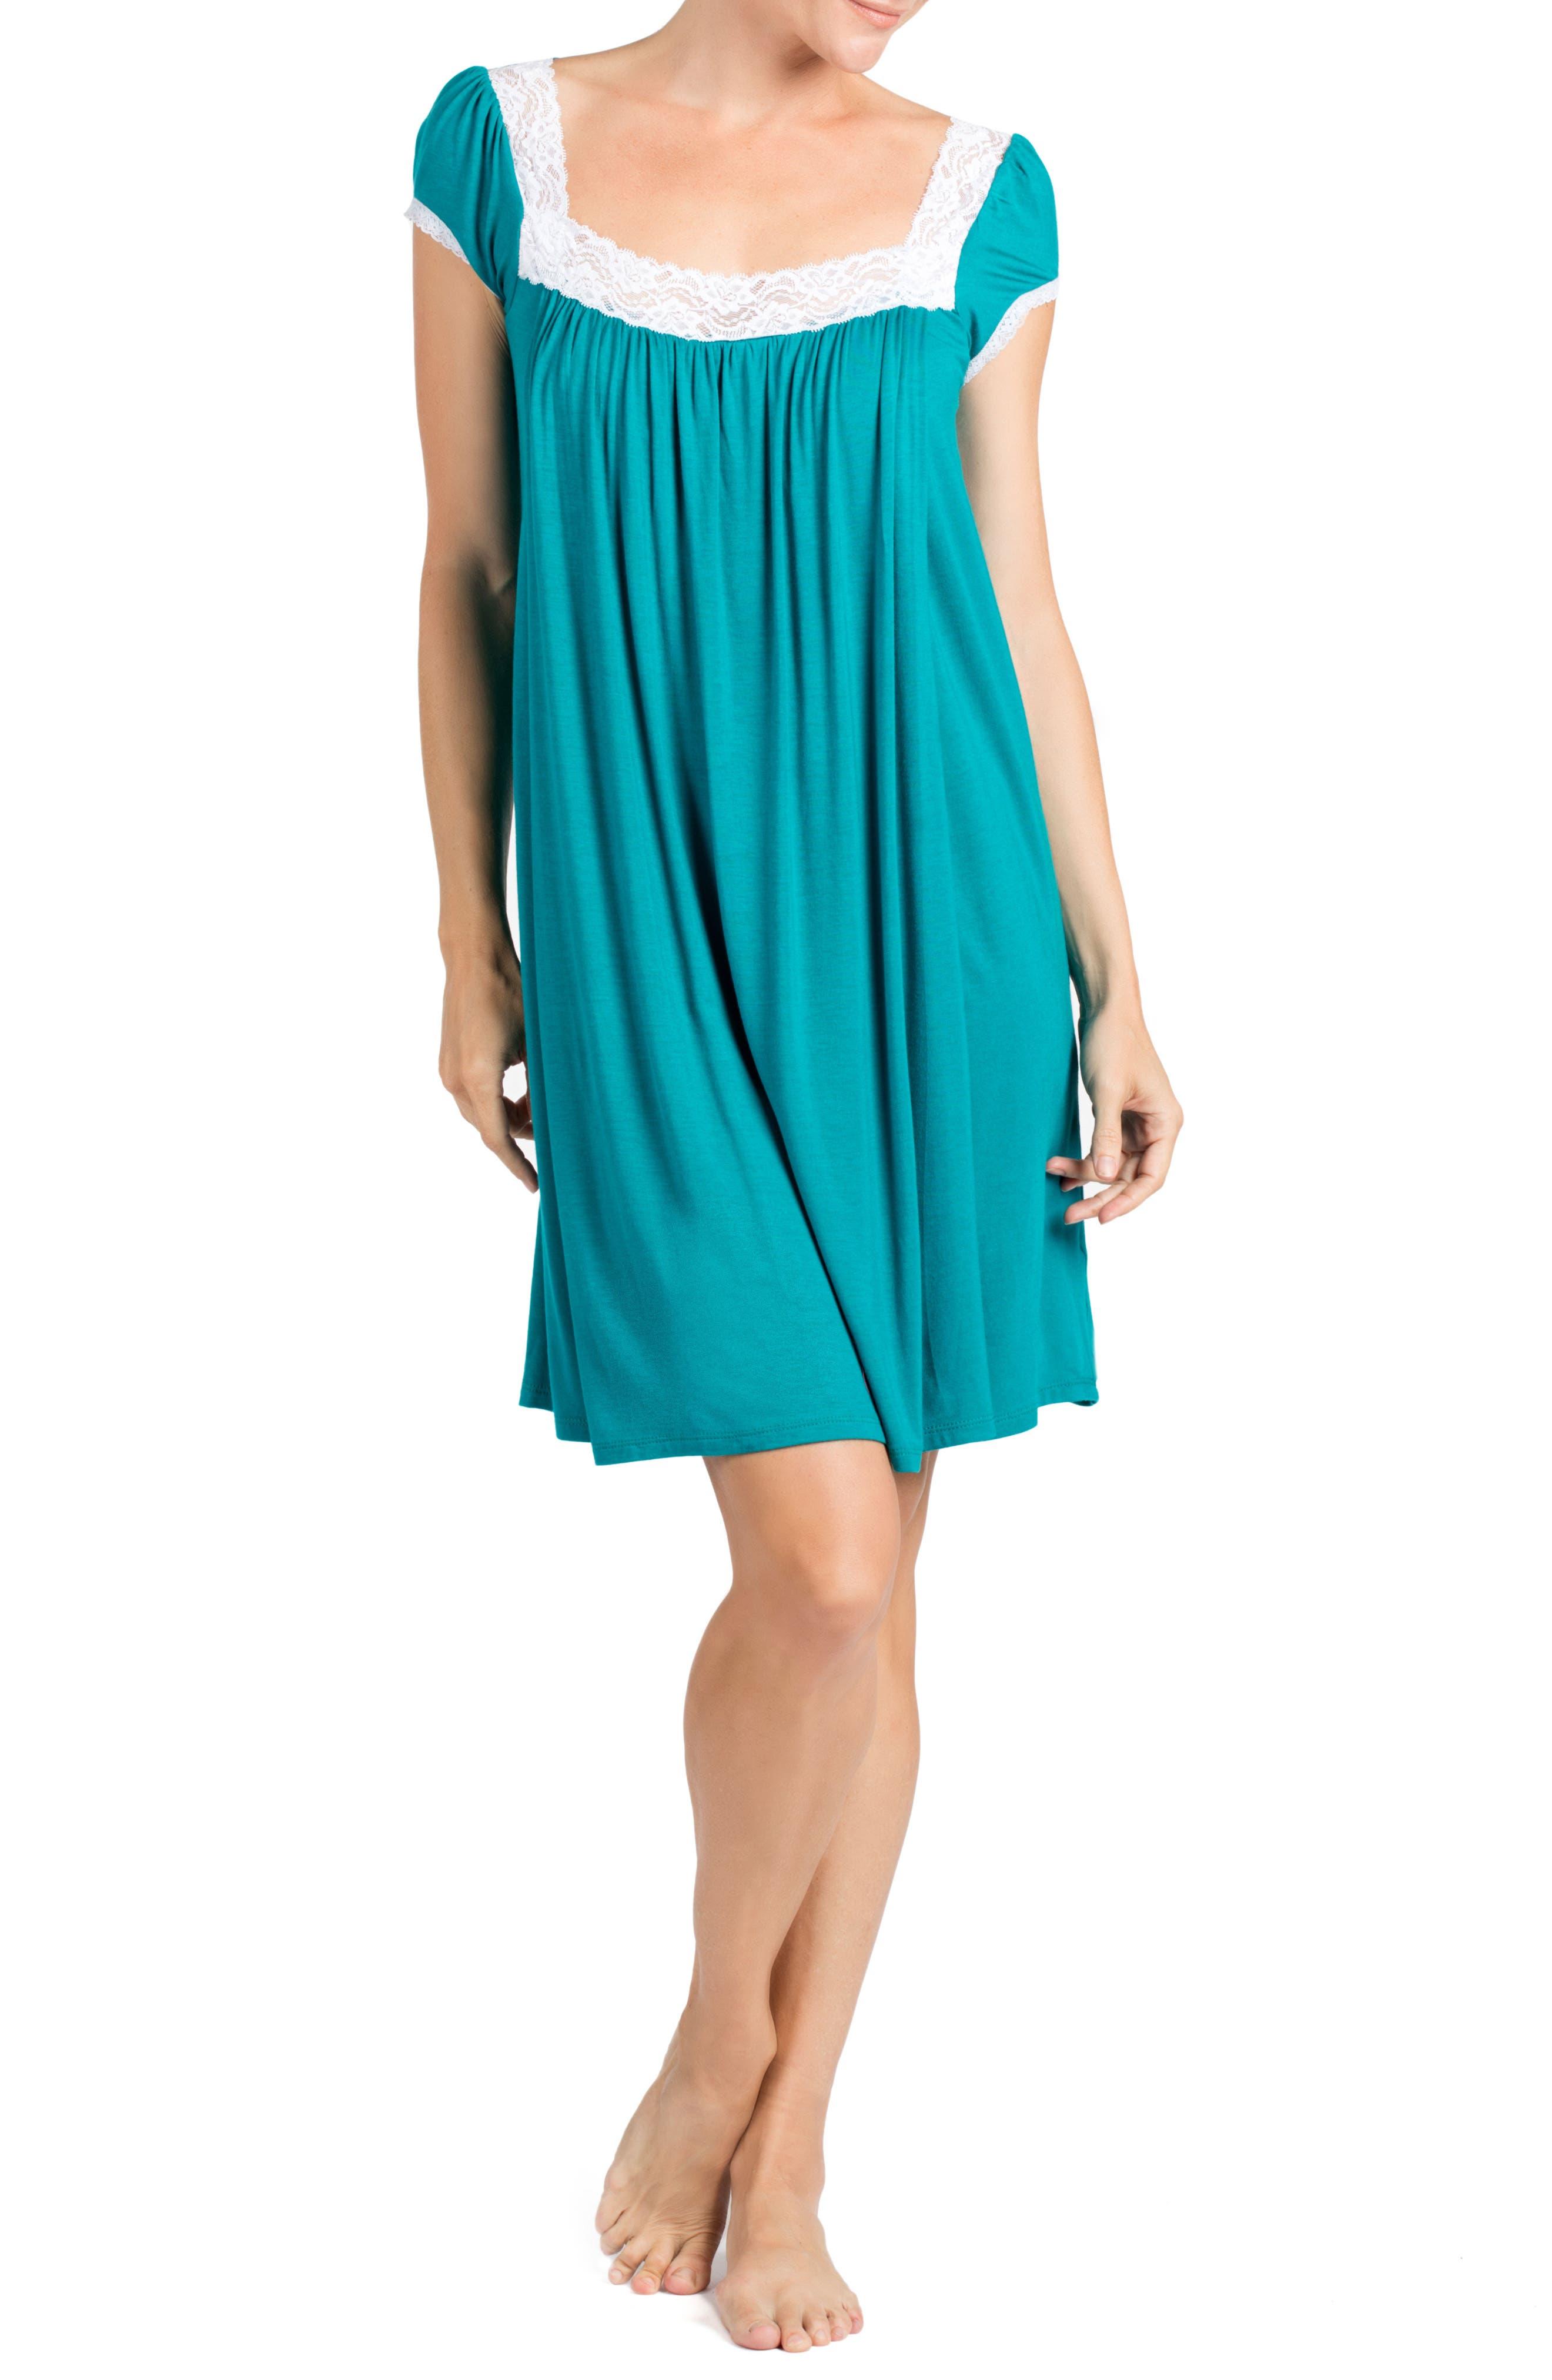 Savi Mom Joliet Maternity/nursing Nightgown, Green